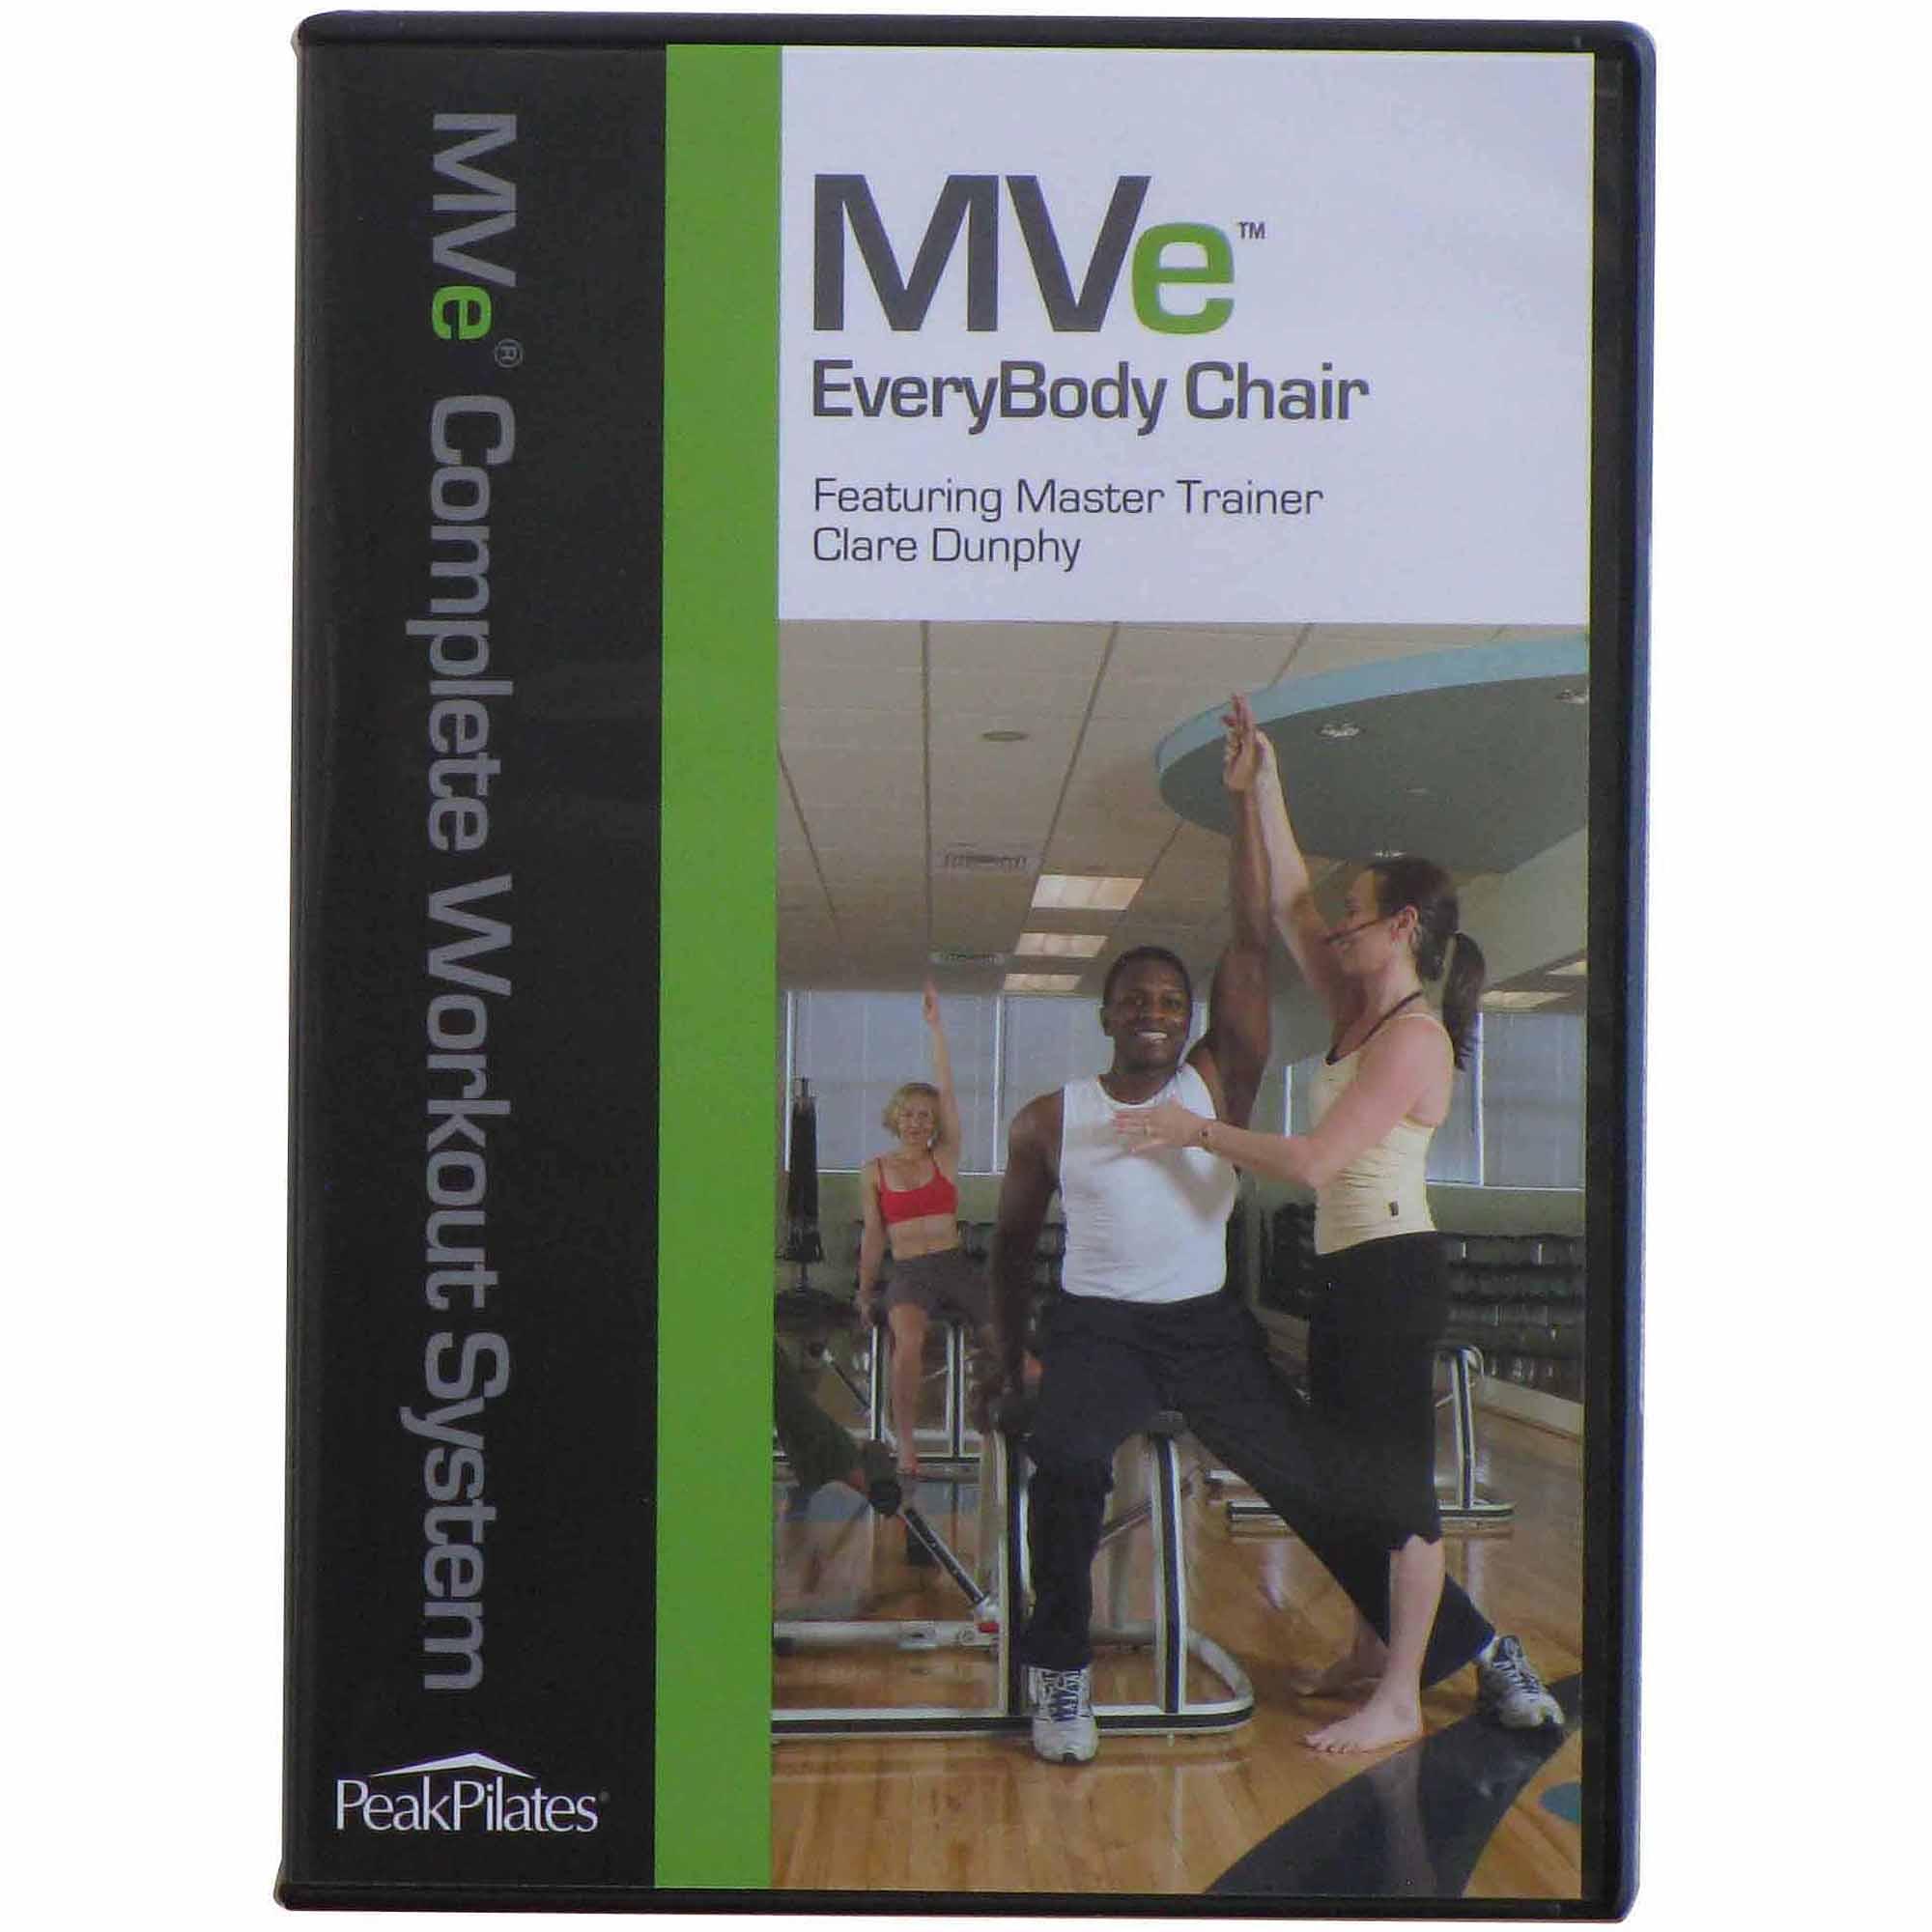 Peak Pilates MVe EveryBody Chair Workout DVD